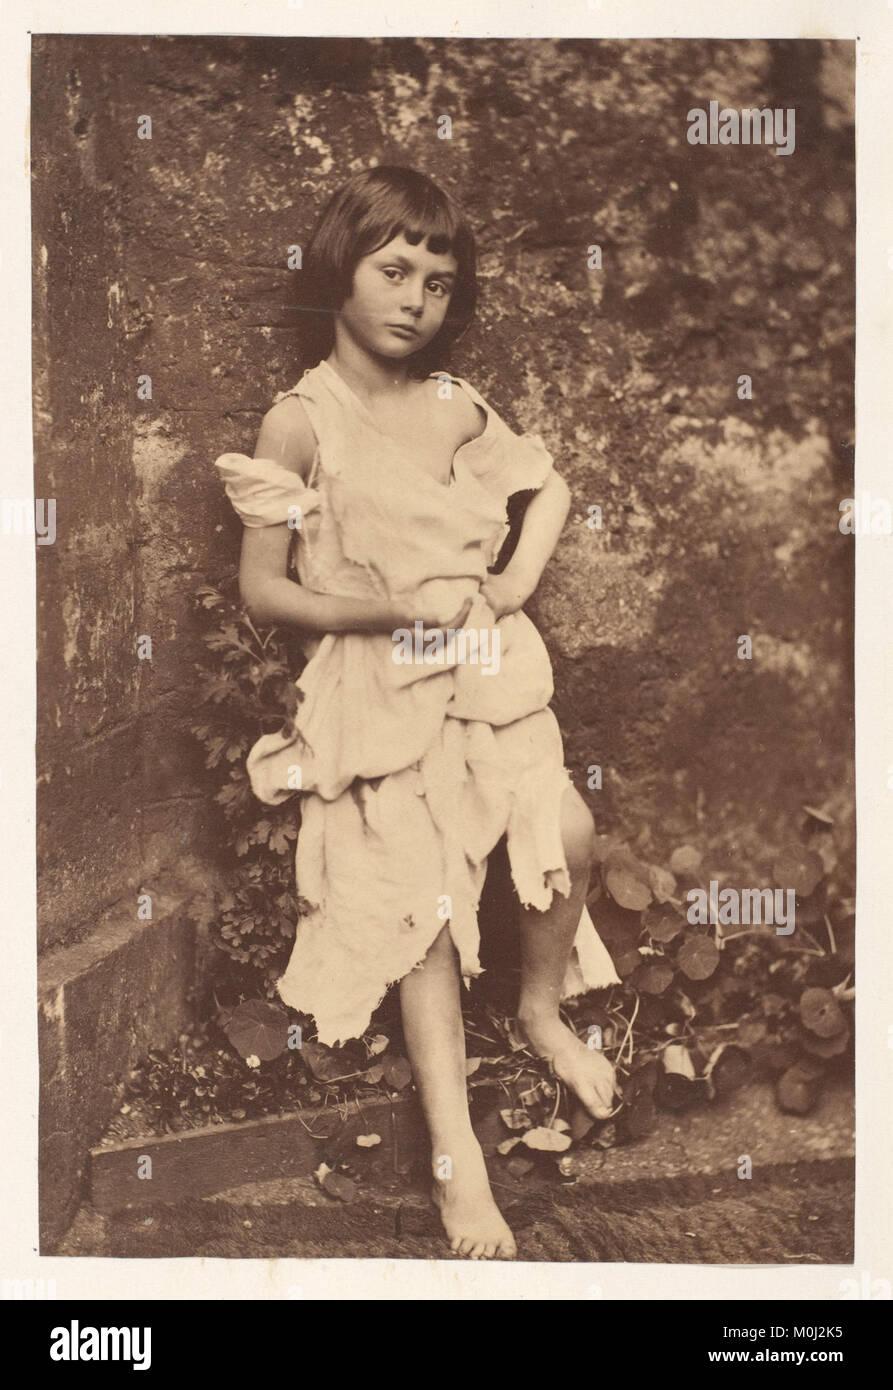 Lewis Carroll (British, Daresbury, Cheshire 1832–1898 Guildford) - Stock Image